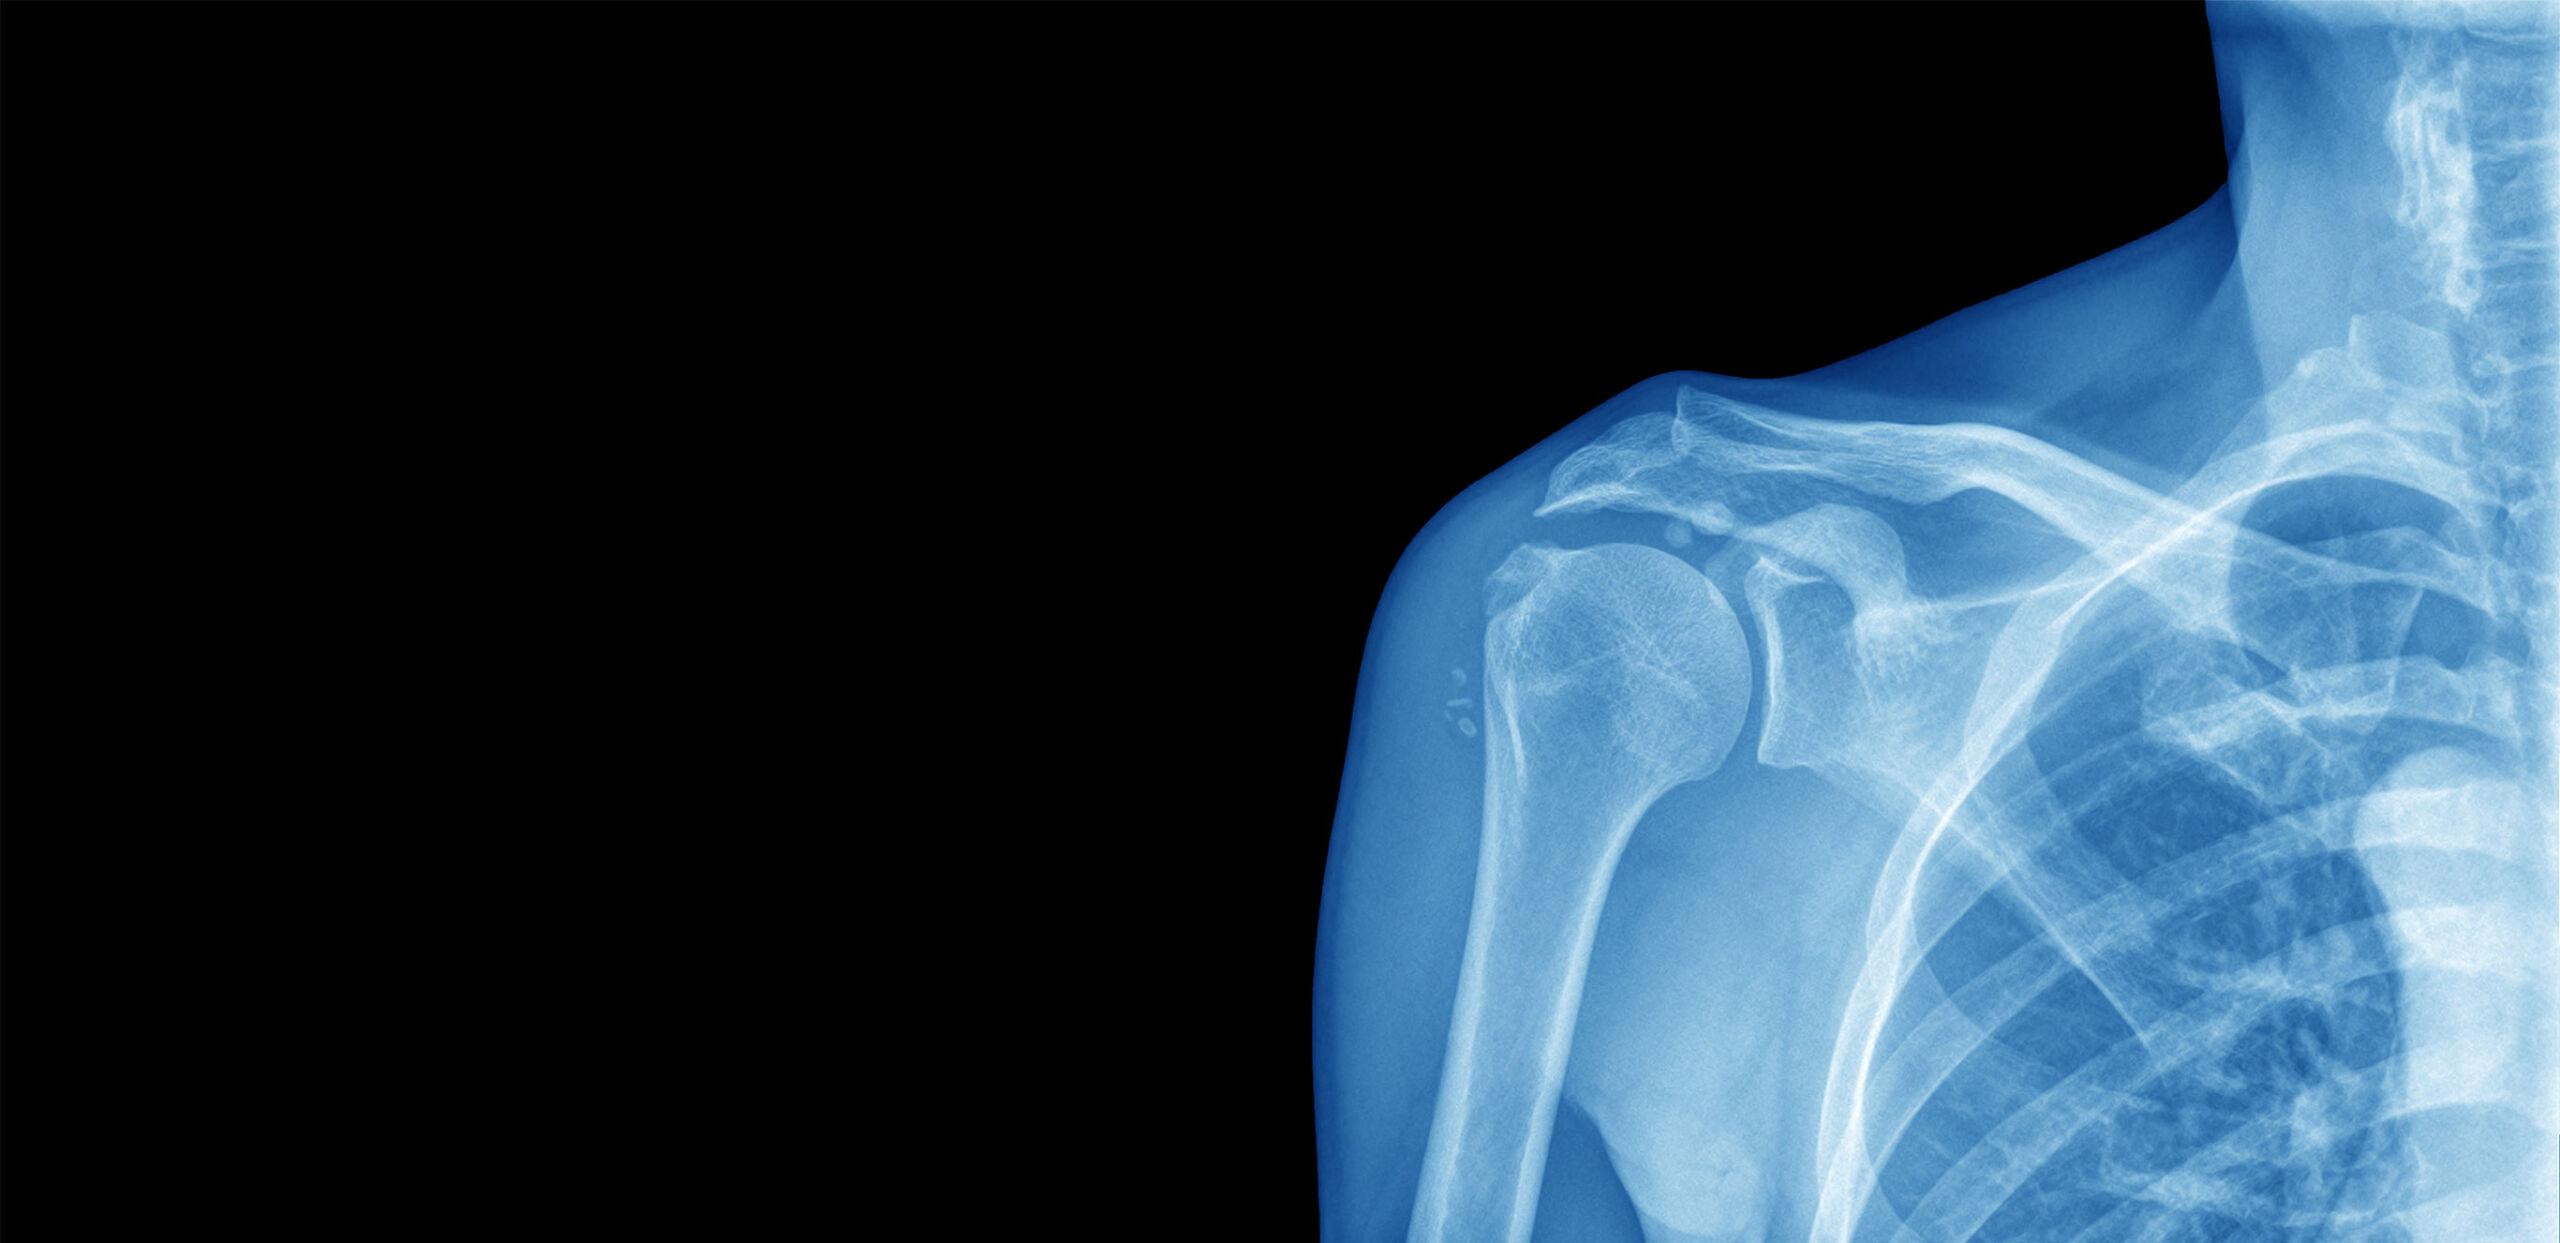 X-ray of human shoulder joint, Cooley Dickinson Hospital, 30 Locust Street, Northampton, MA 01060.